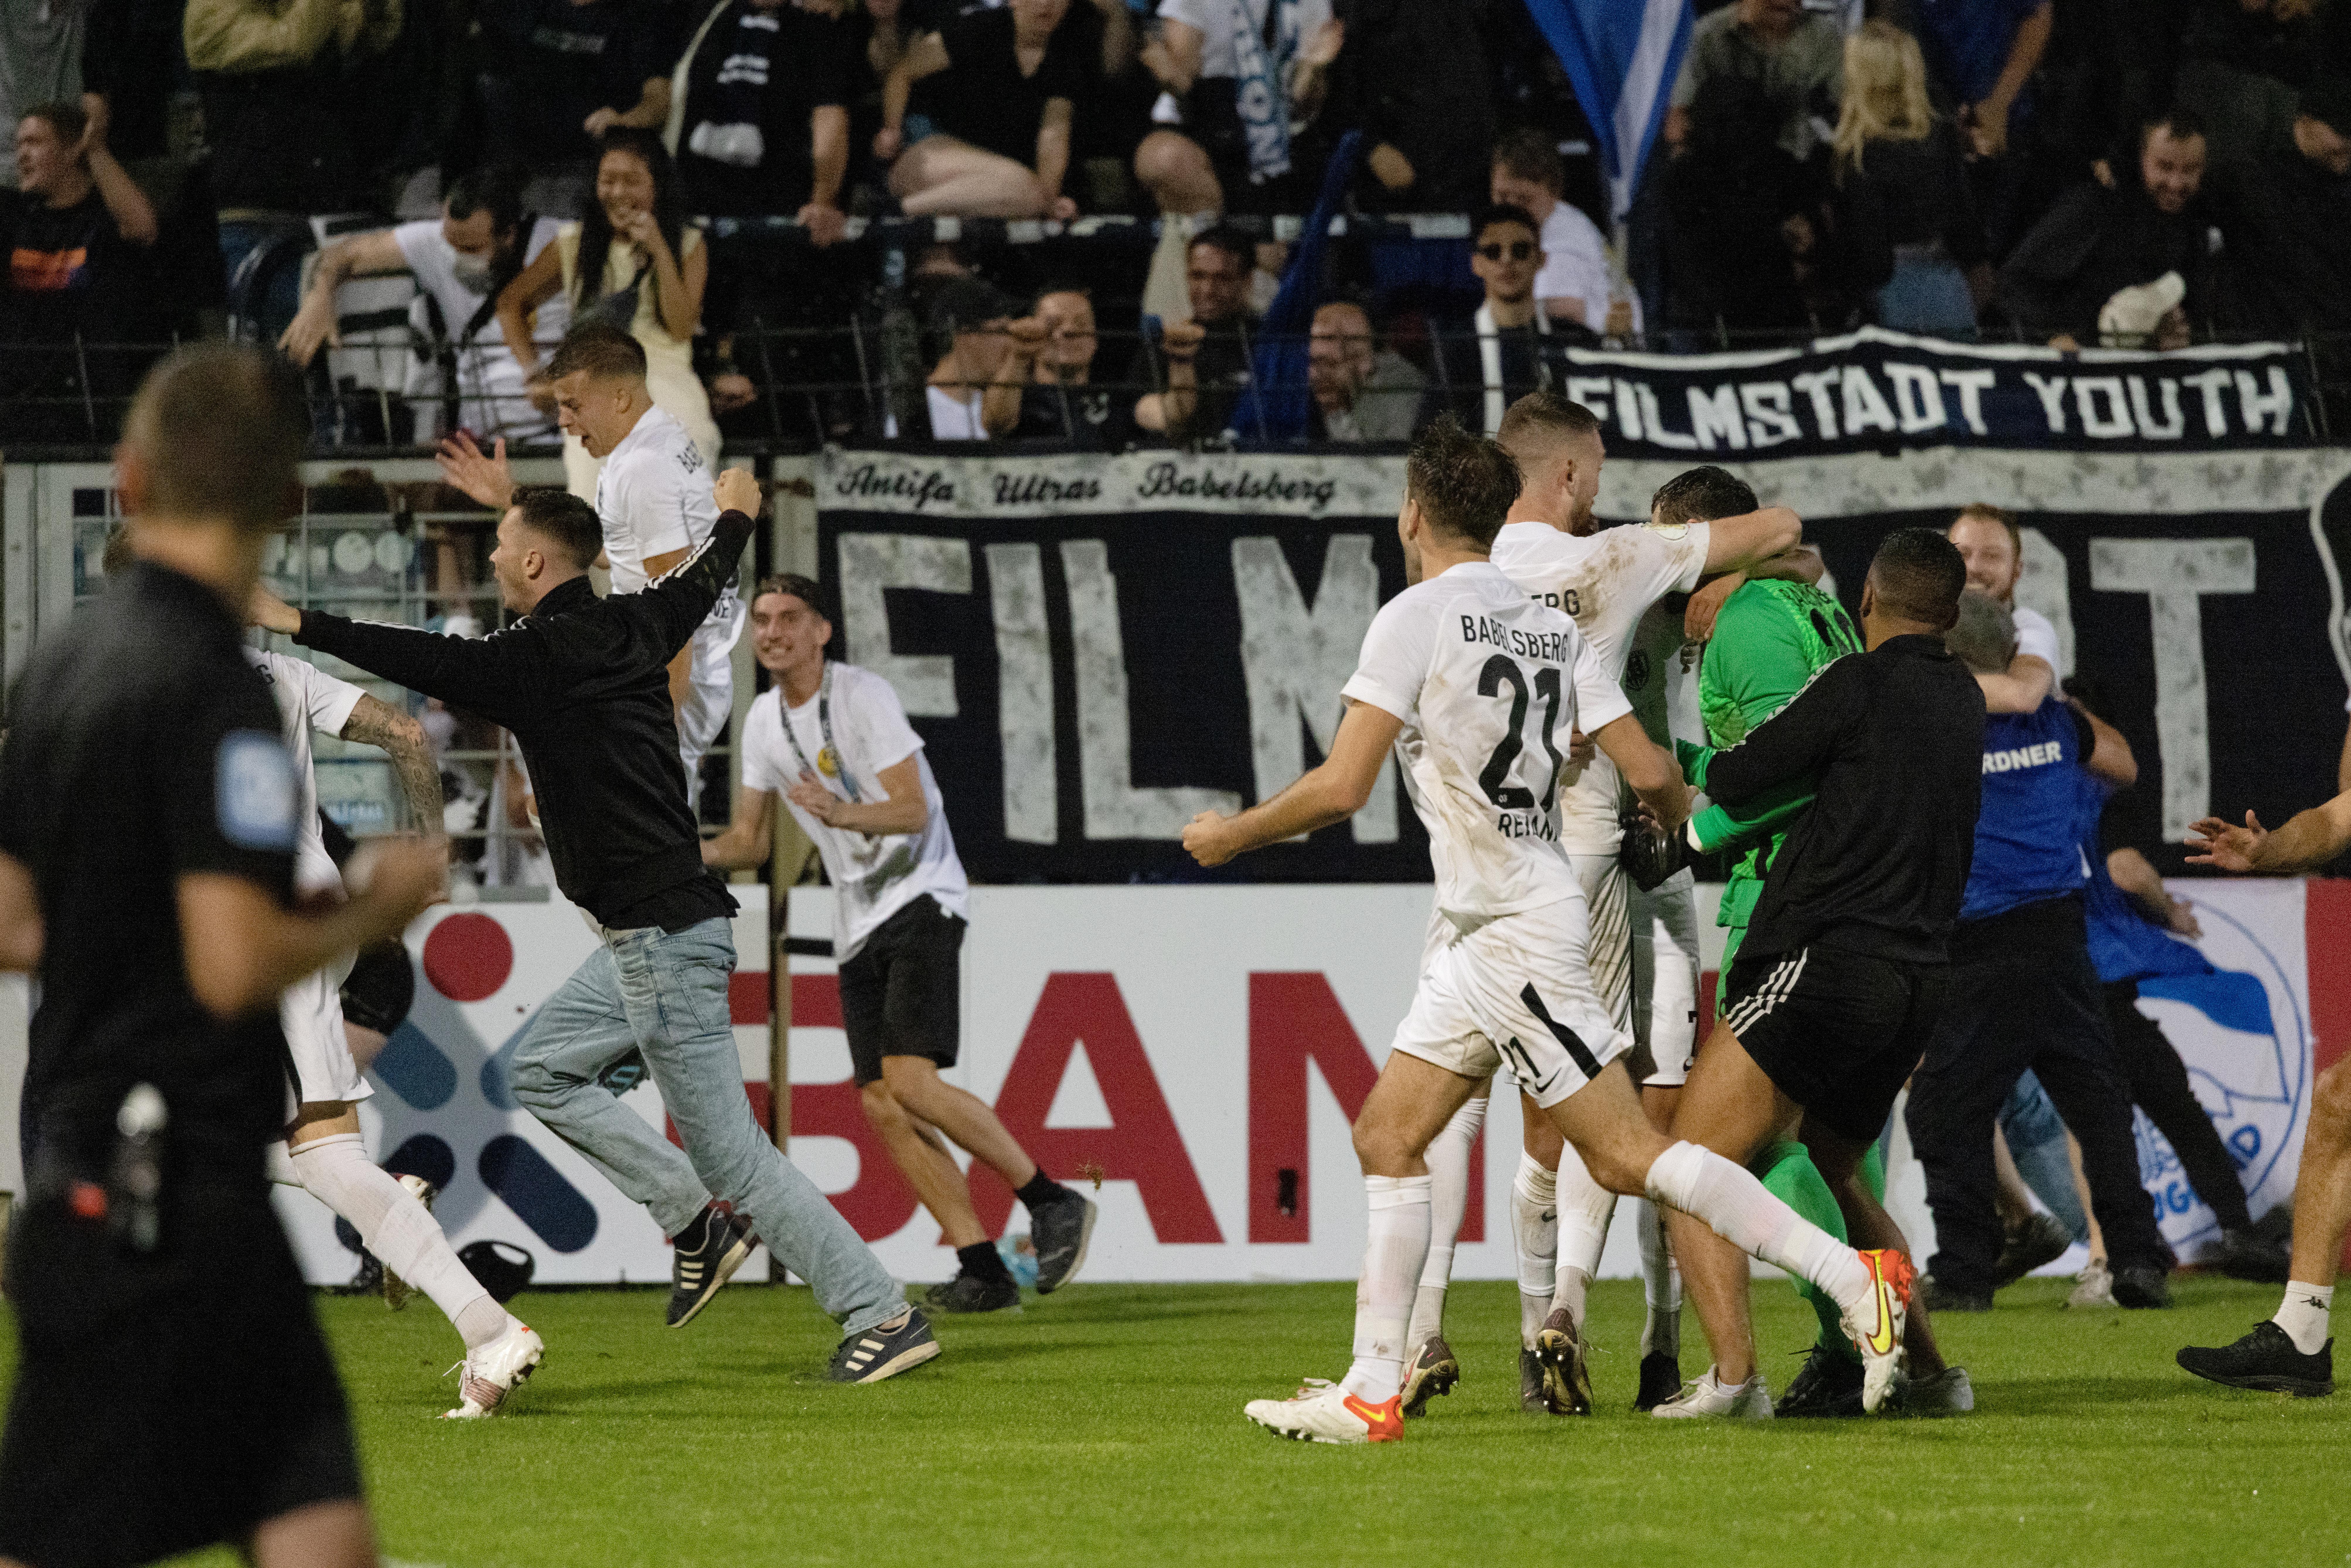 SV Babelsberg 03 v SpVgg Greuther Fürth - DFB Cup: First Round